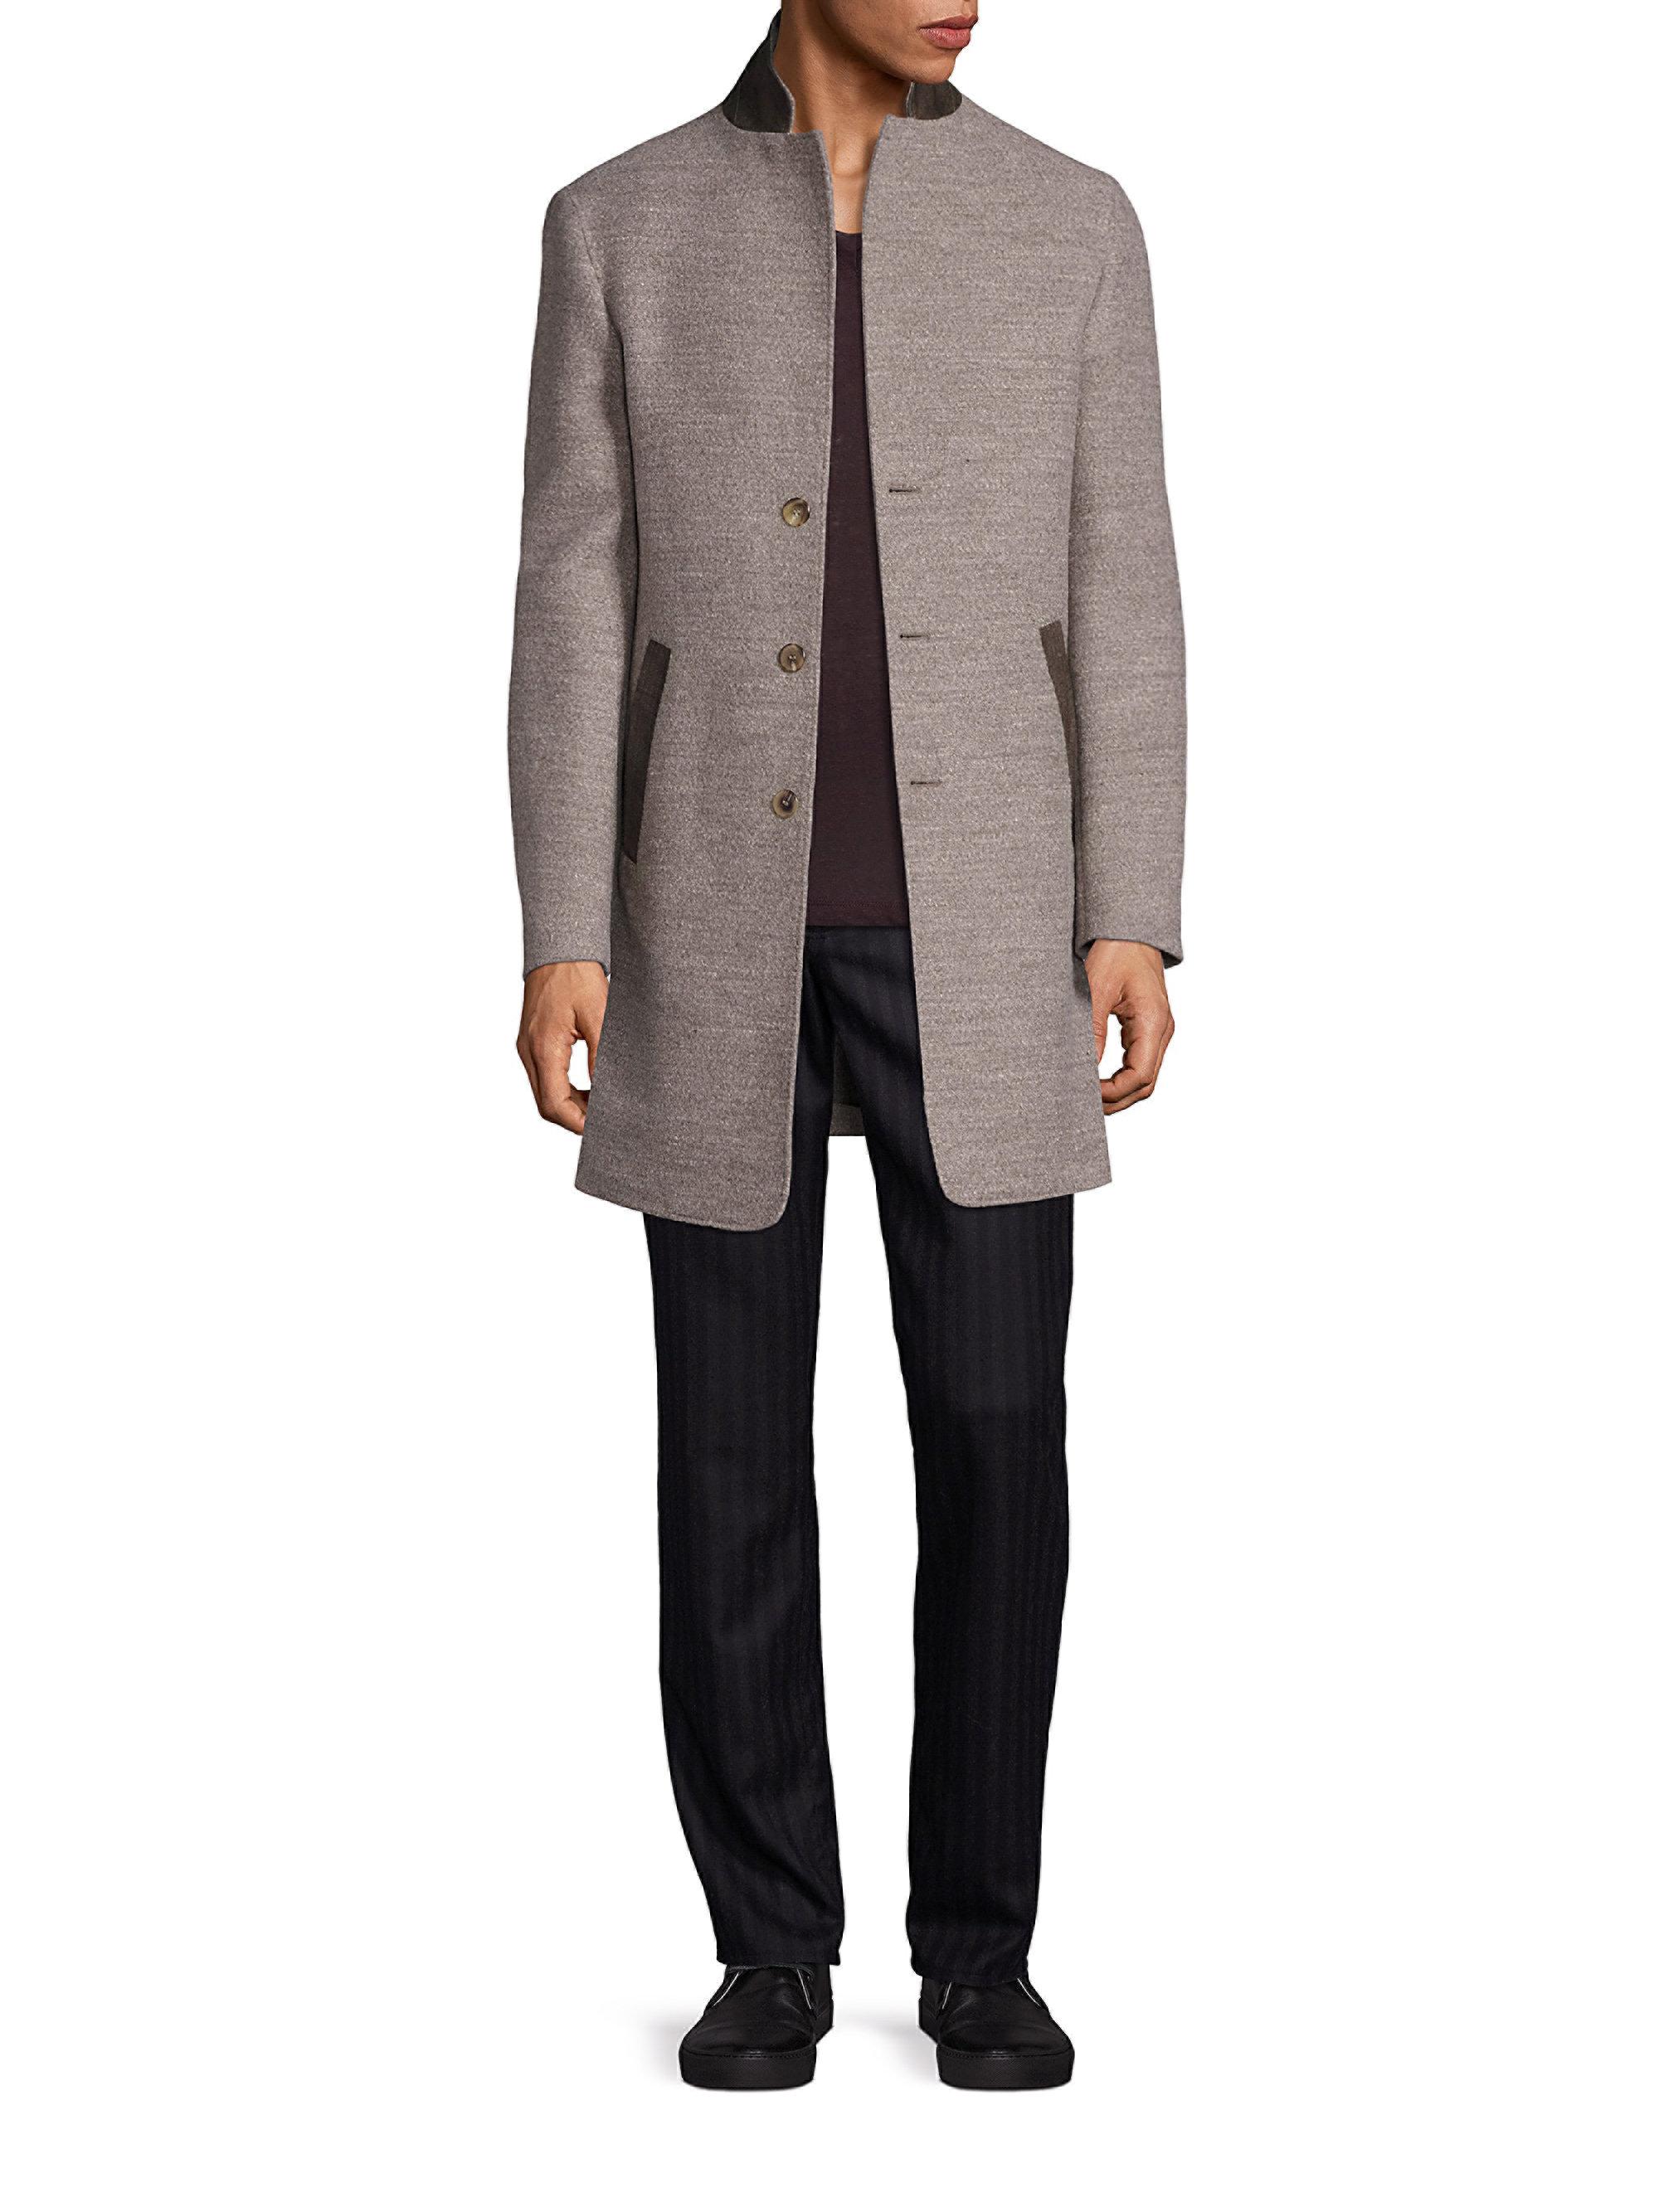 Mens jacket david jones - Austin Melton Jacket David Jones